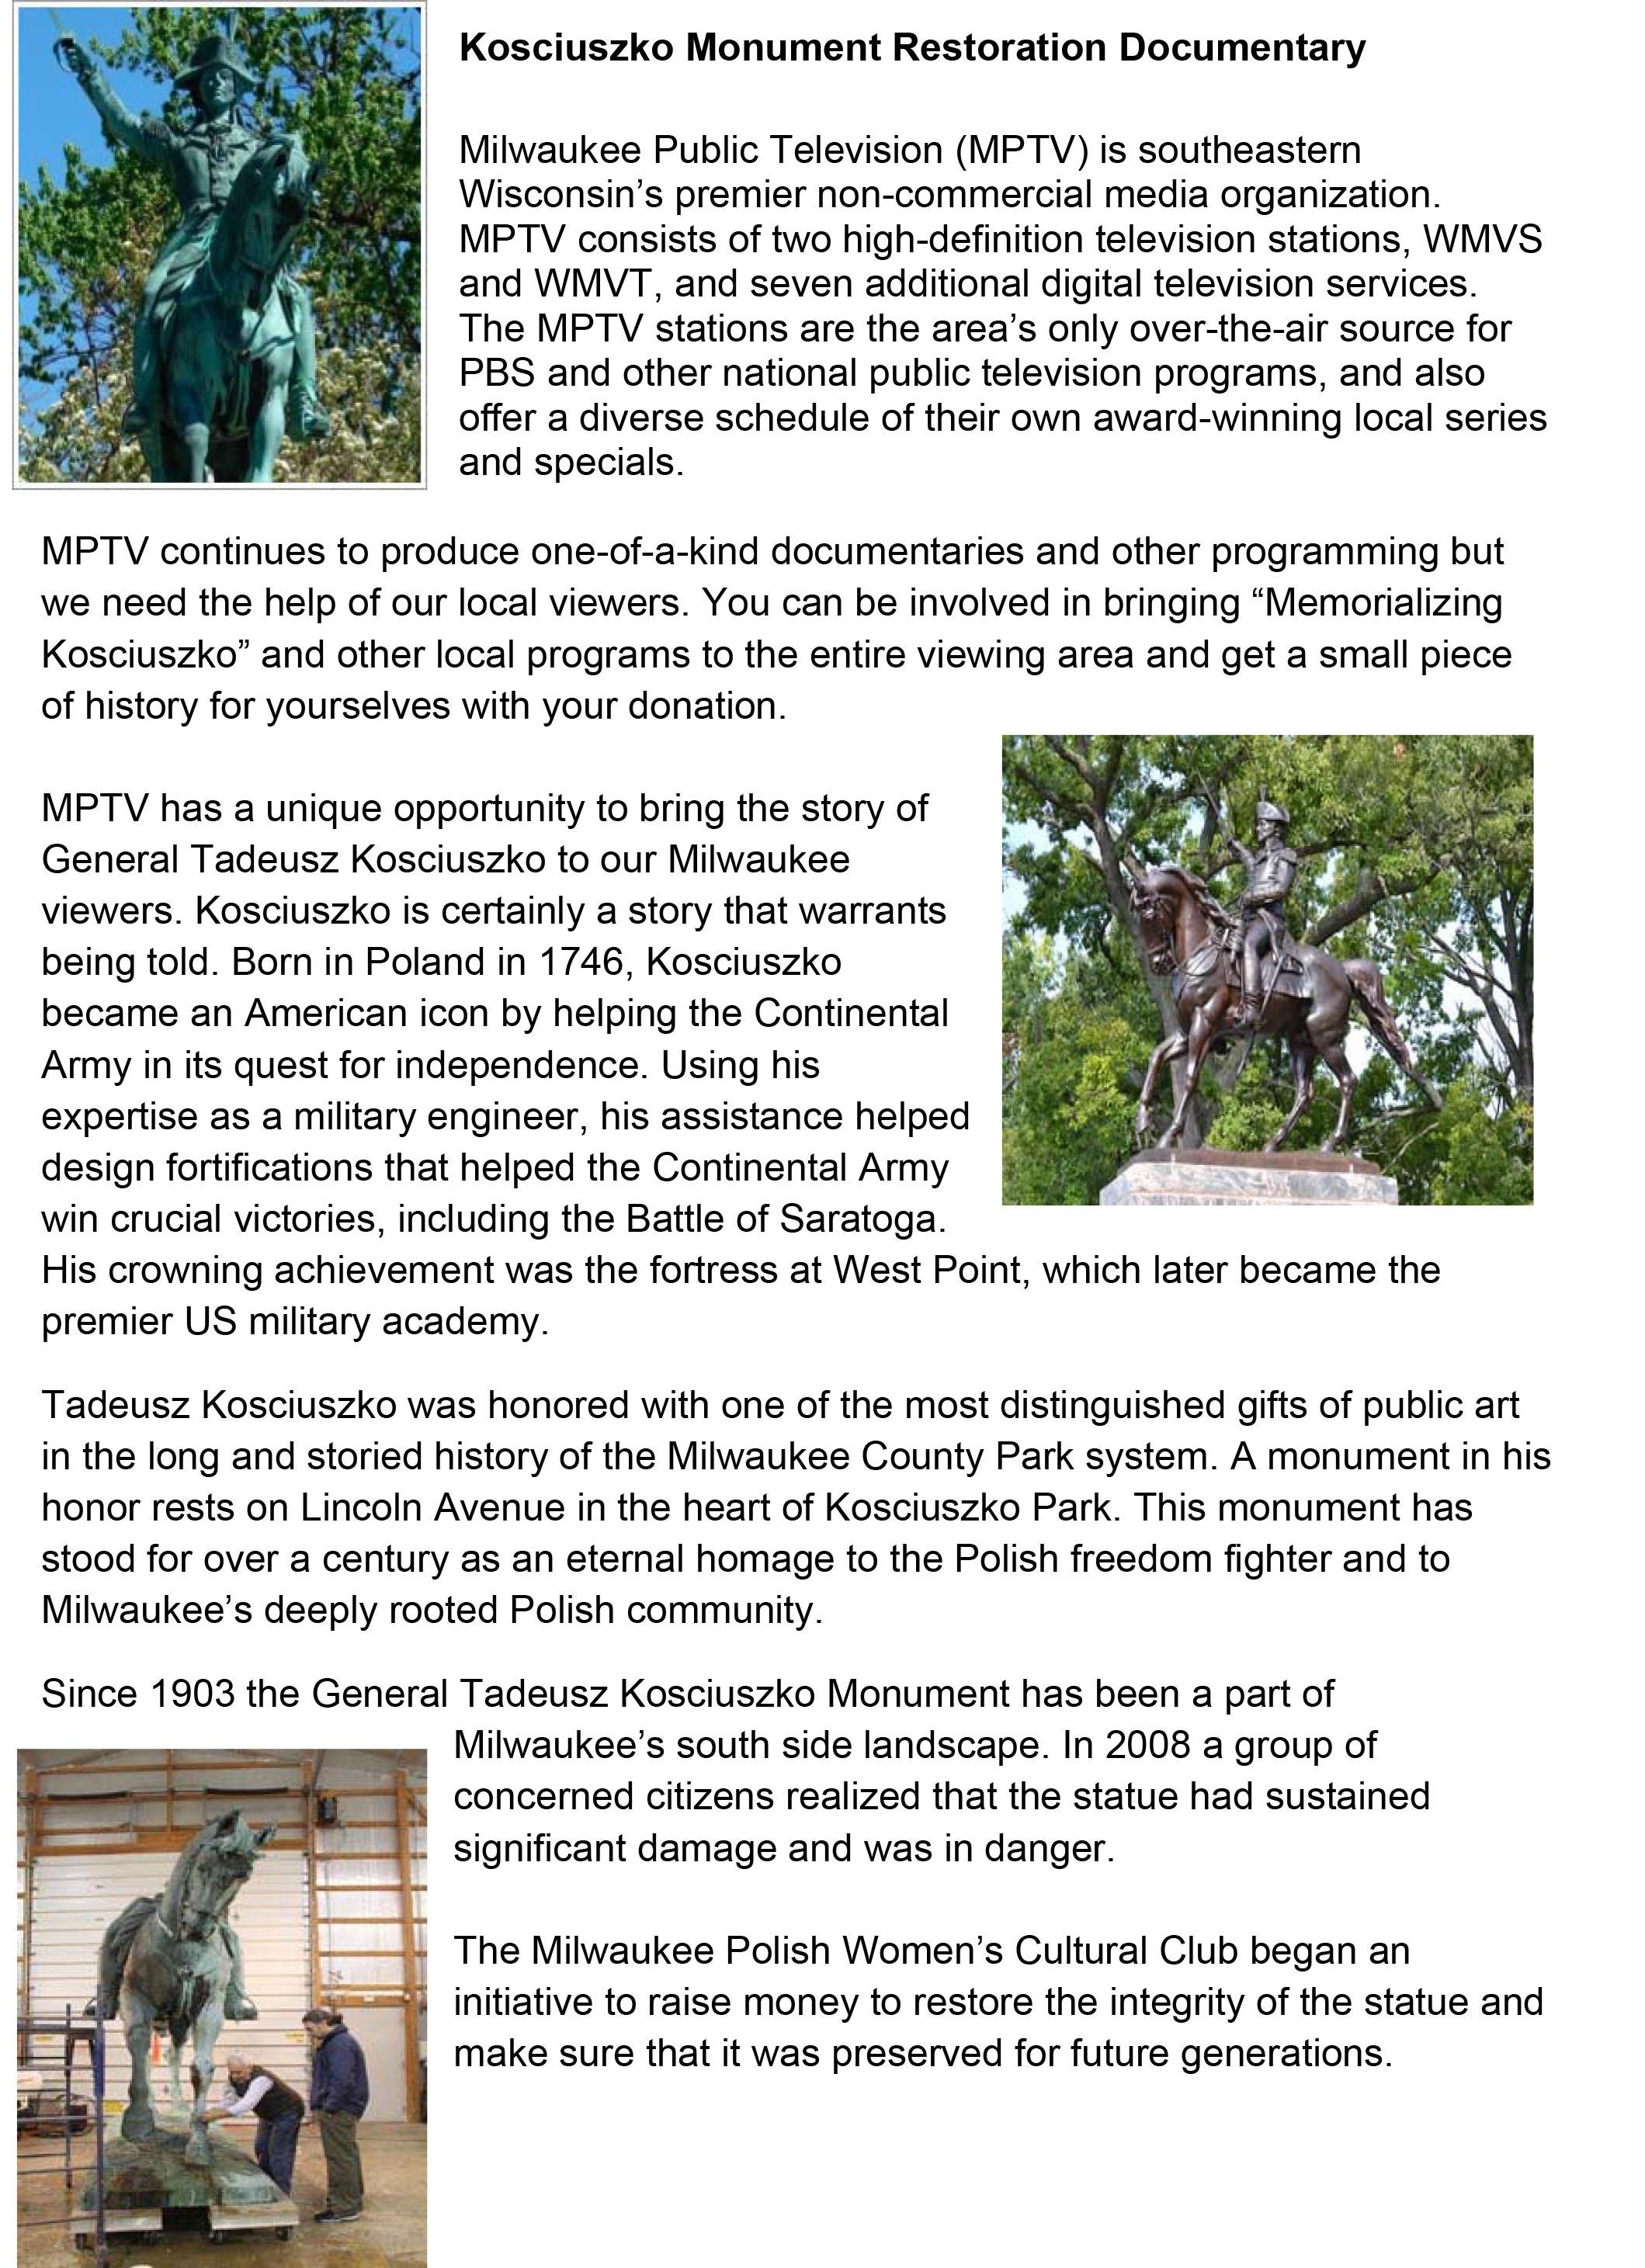 Kosciuszko Monument Restoration Documentary | Indiegogo